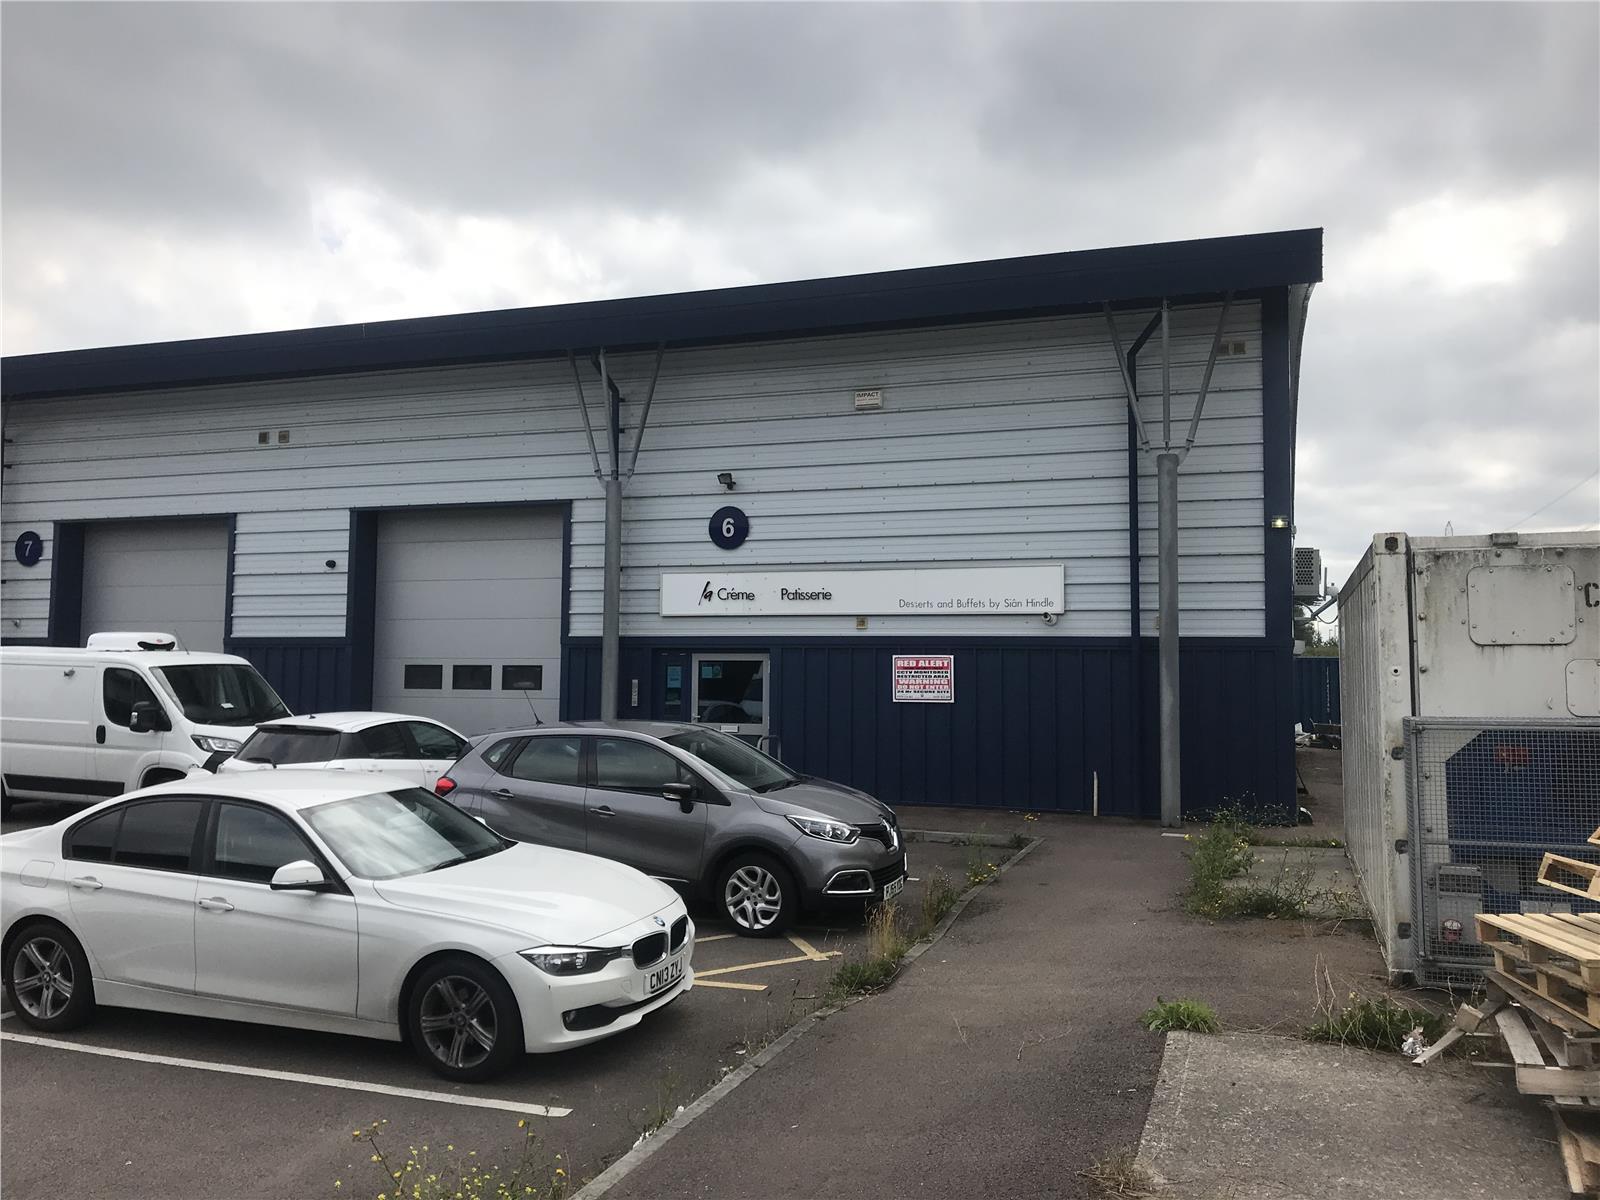 Unit 6 Mardon Park Off Central Avenue, Baglan, Port Talbot, Neath Port Talbot, SA12 7AX